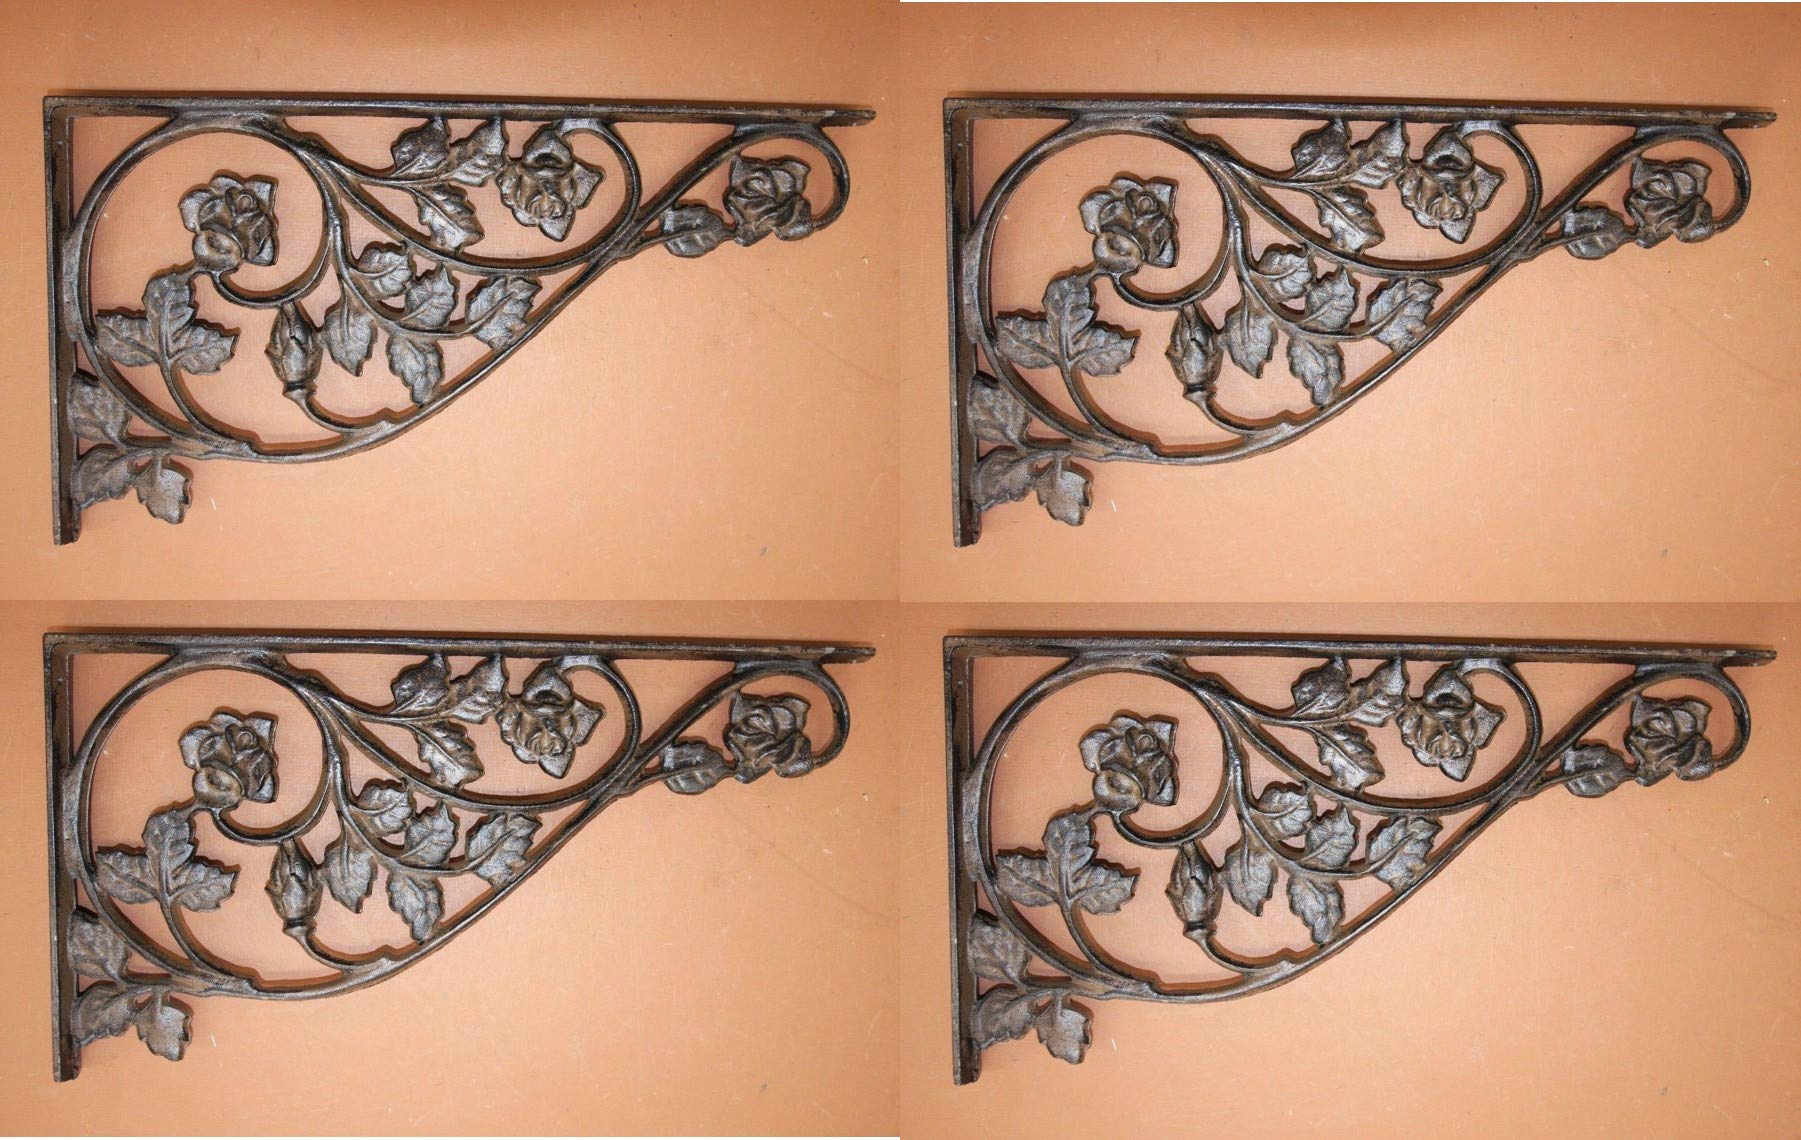 Southern Metal Set of 4 Extra Large Cast Iron Shelf Brackets 16 7/8'' Vintage Look Rose Design, B-20